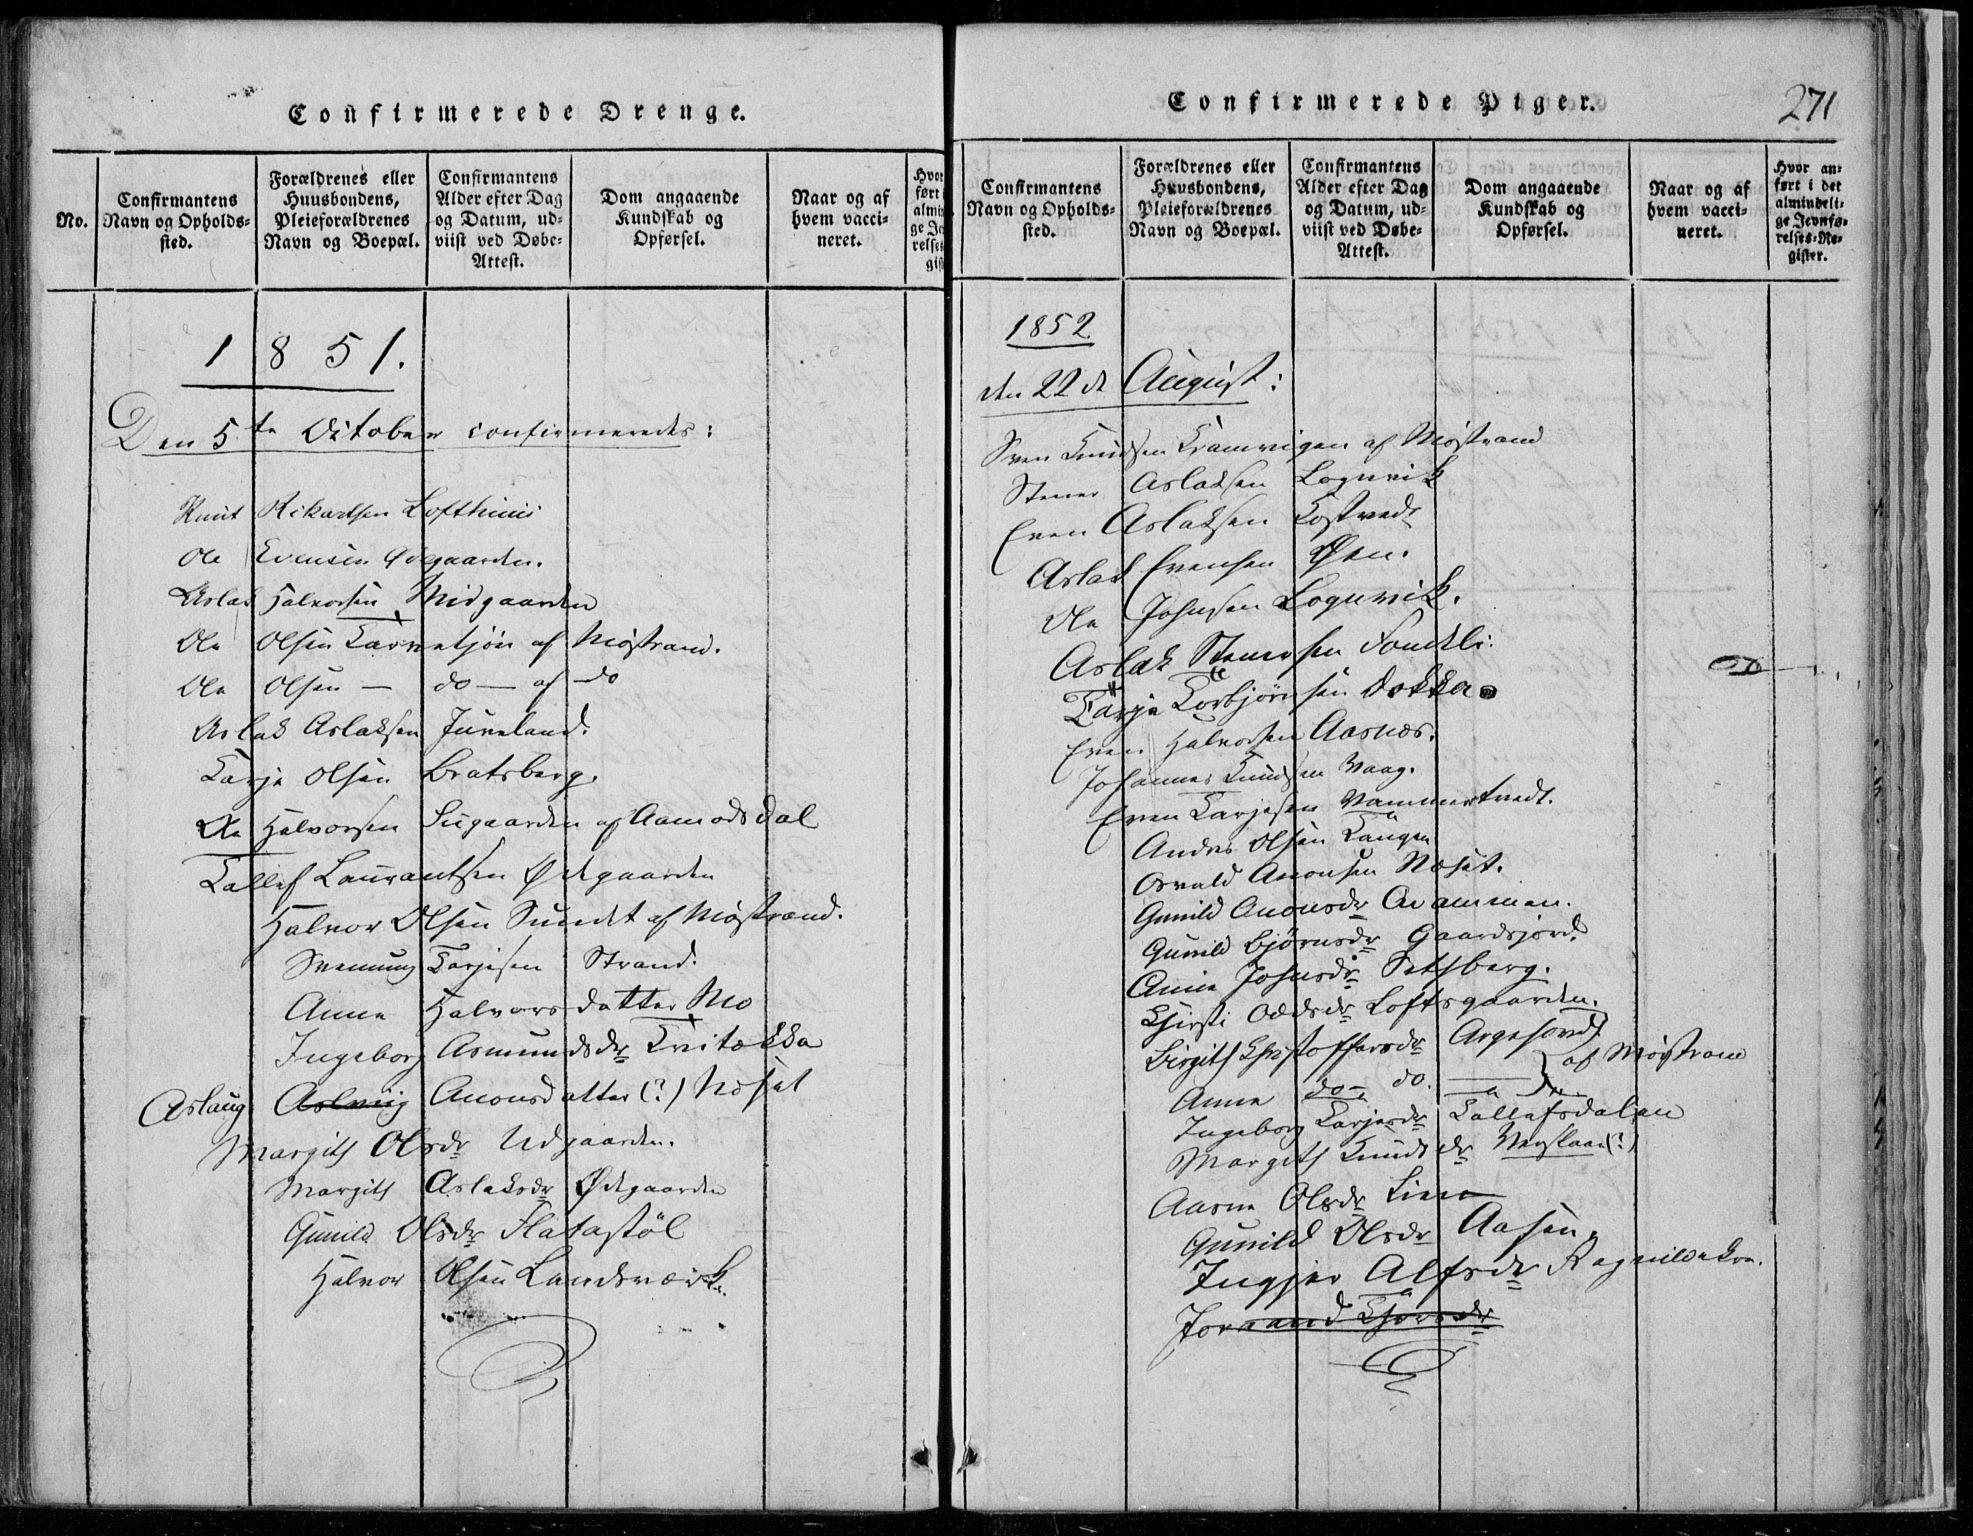 SAKO, Rauland kirkebøker, F/Fa/L0001: Ministerialbok nr. 1, 1814-1859, s. 271